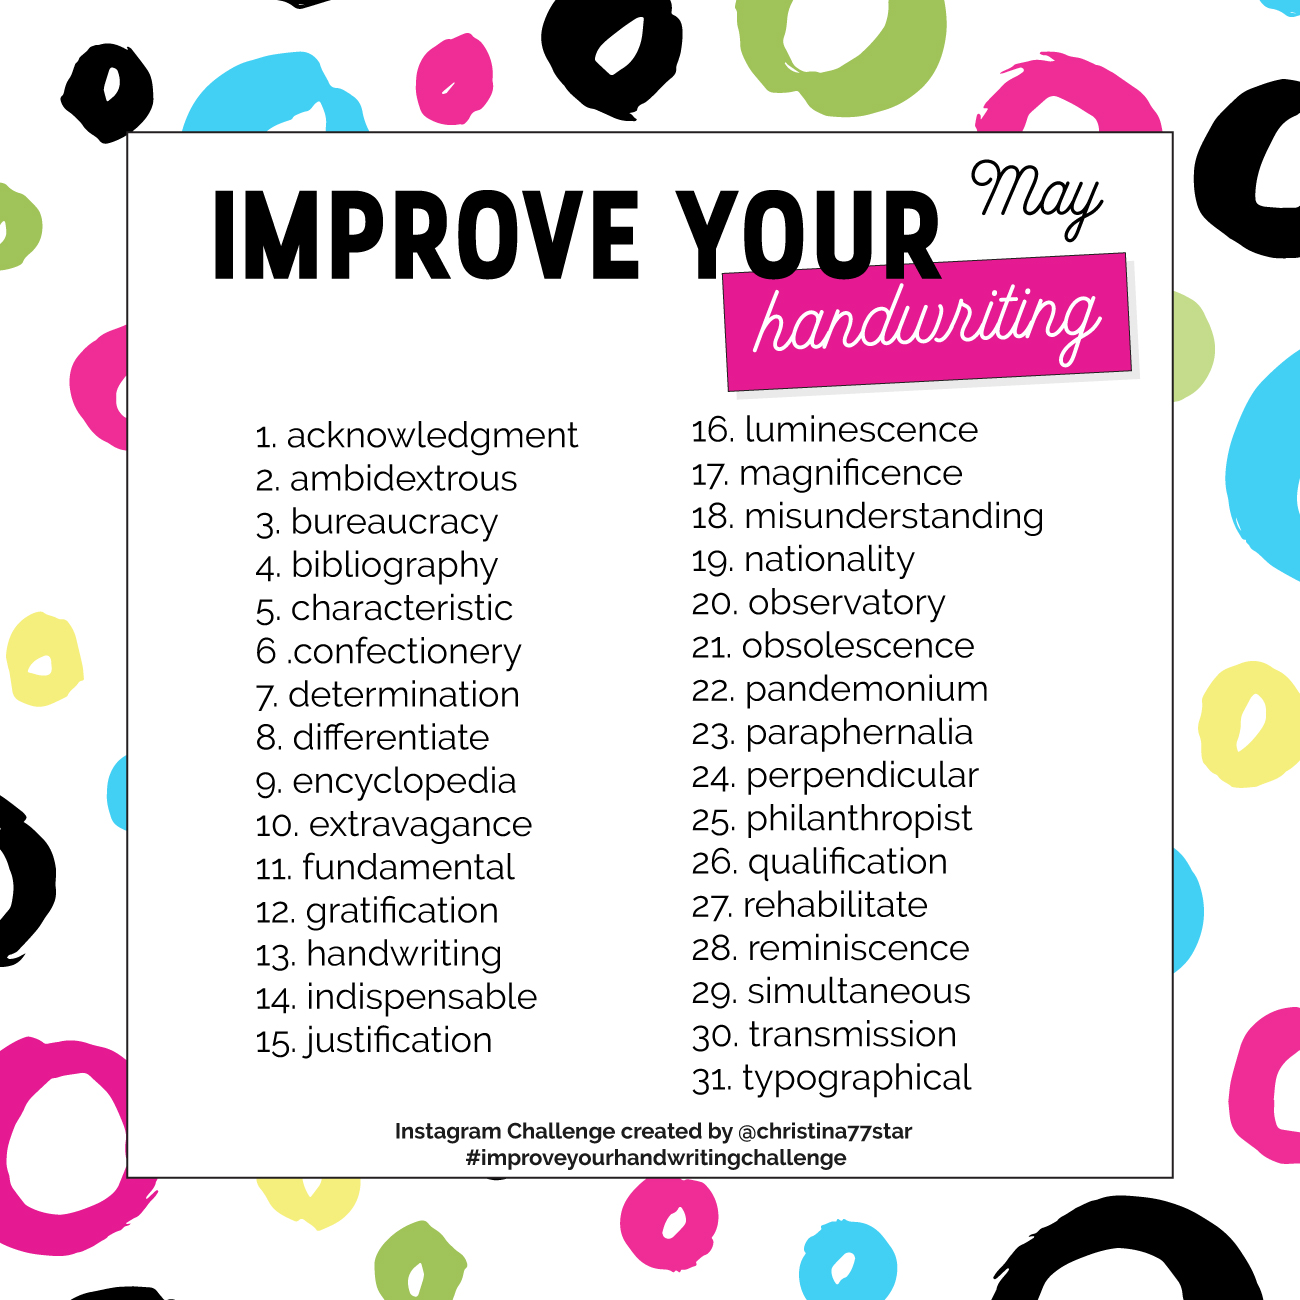 Improve Your Handwriting Instagram Challenge - March